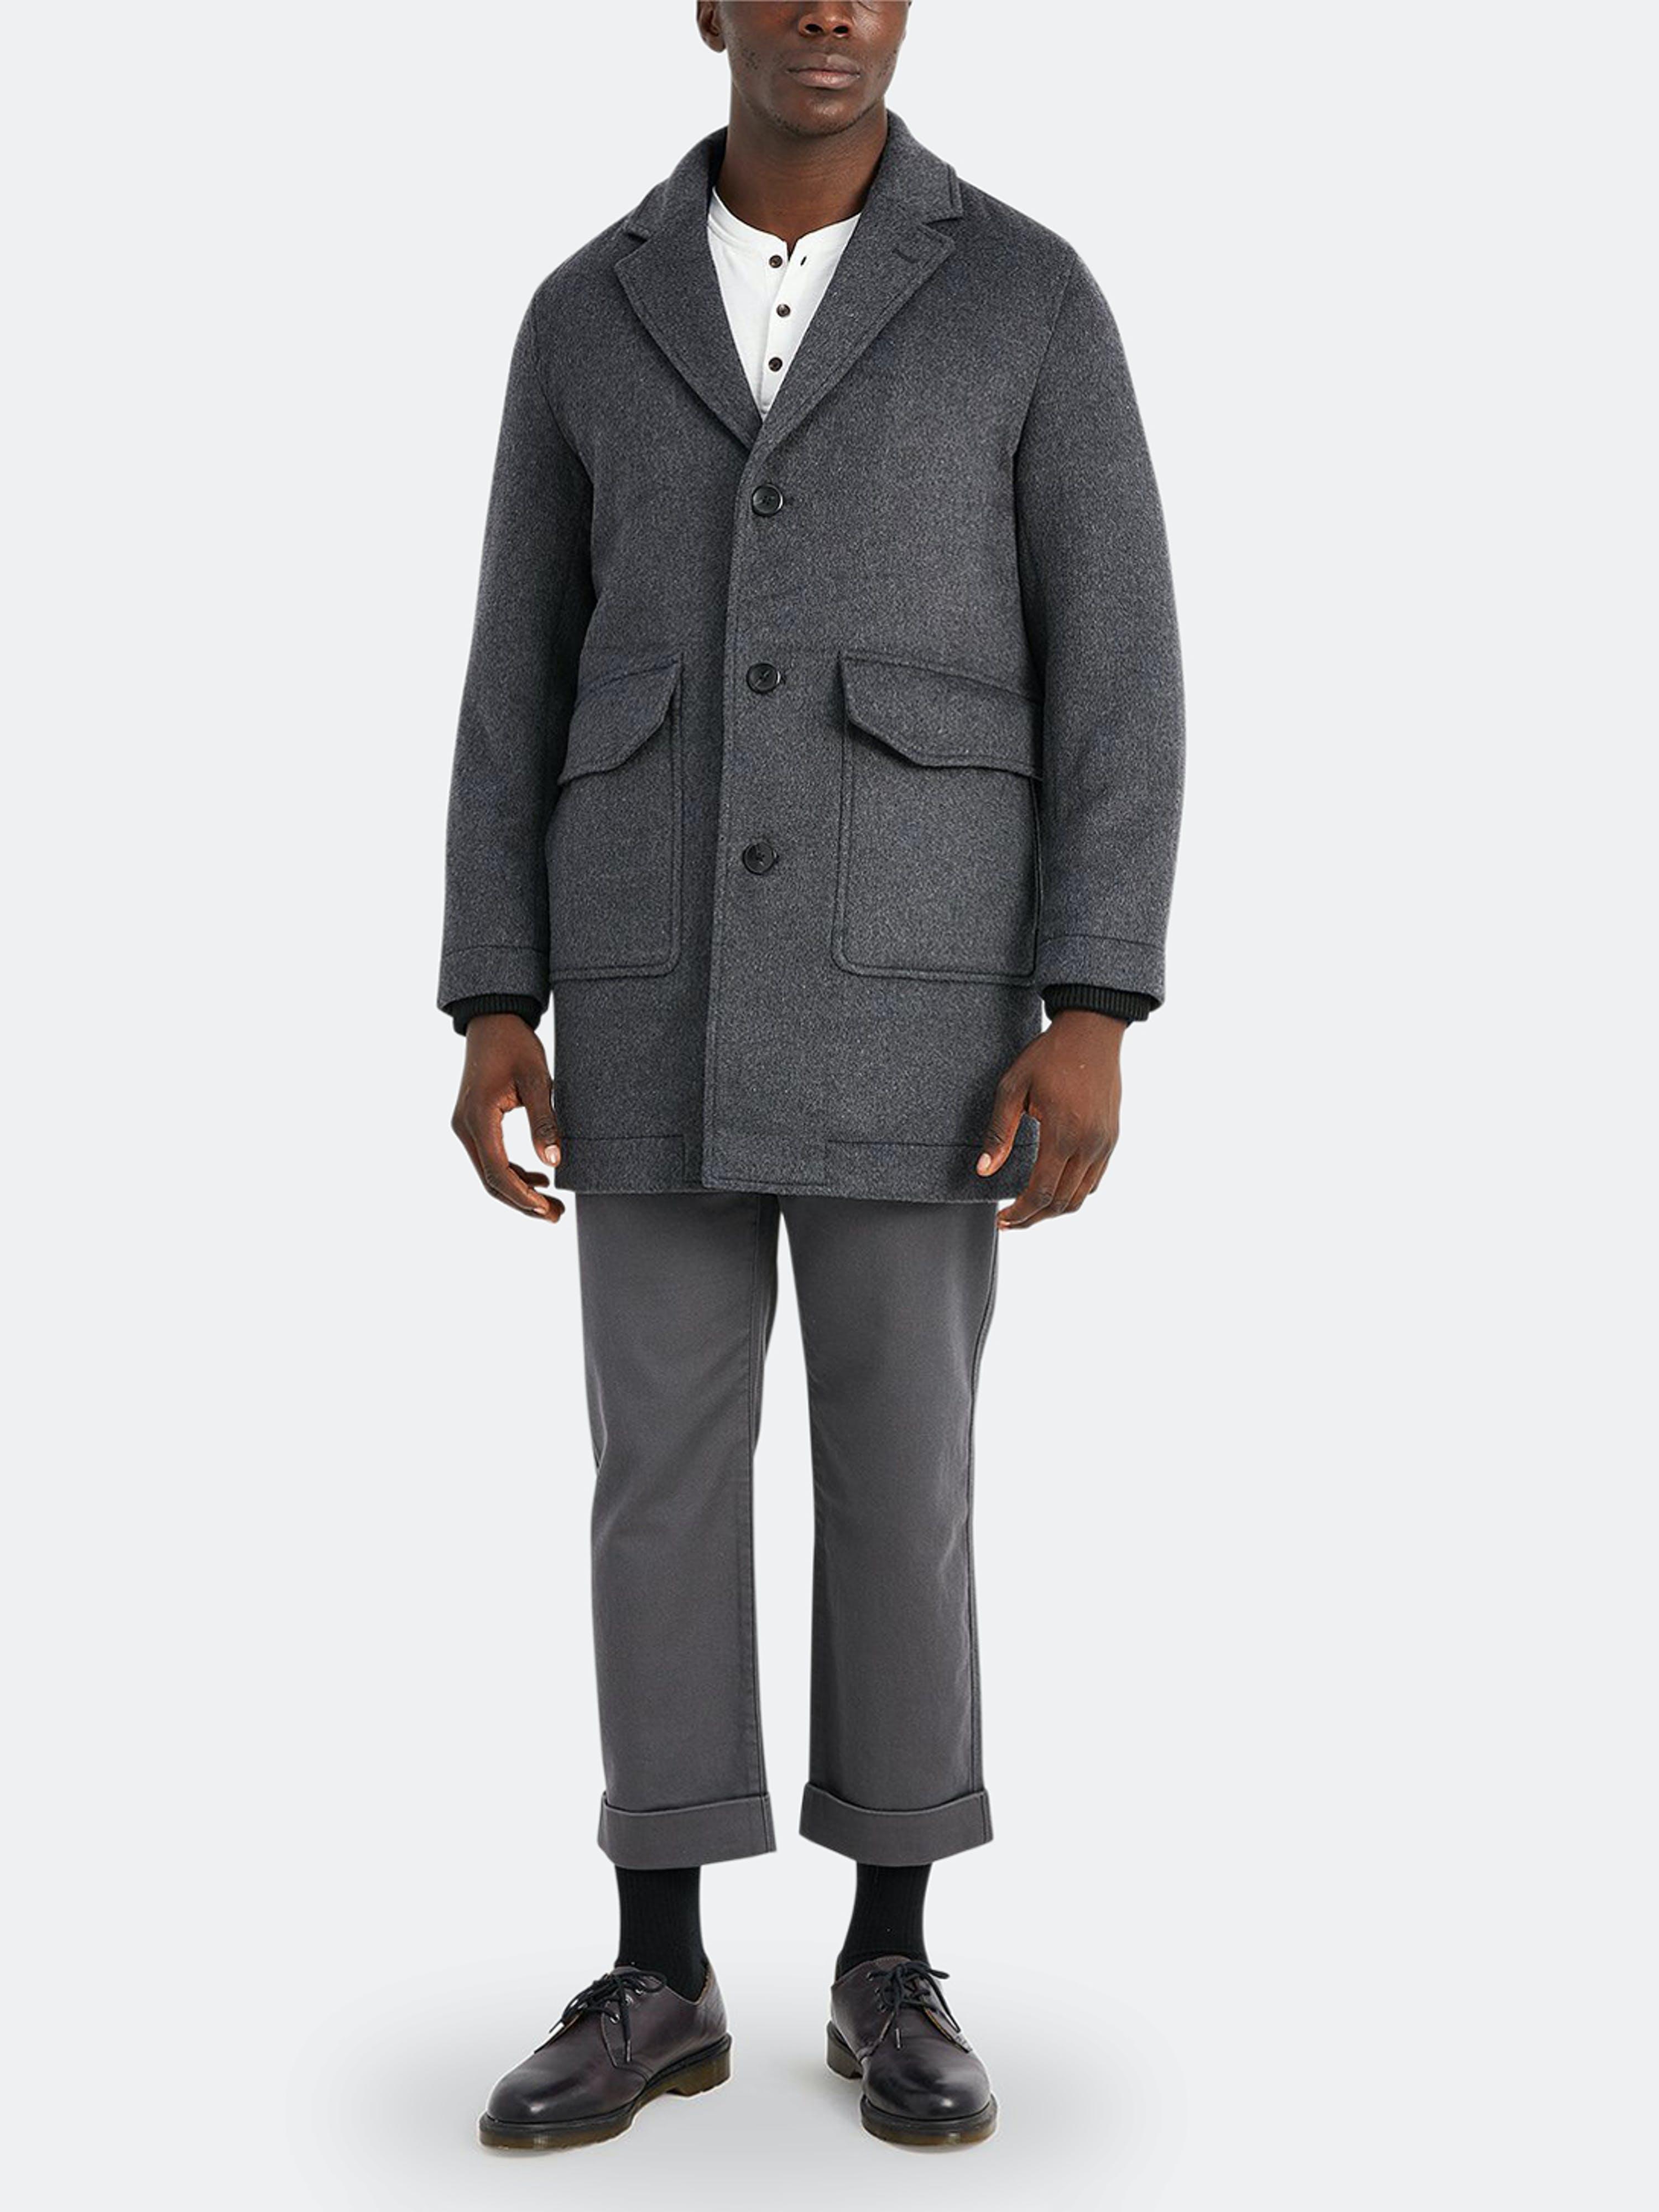 ONS Clothing Dorian Wool Coat  - Grey